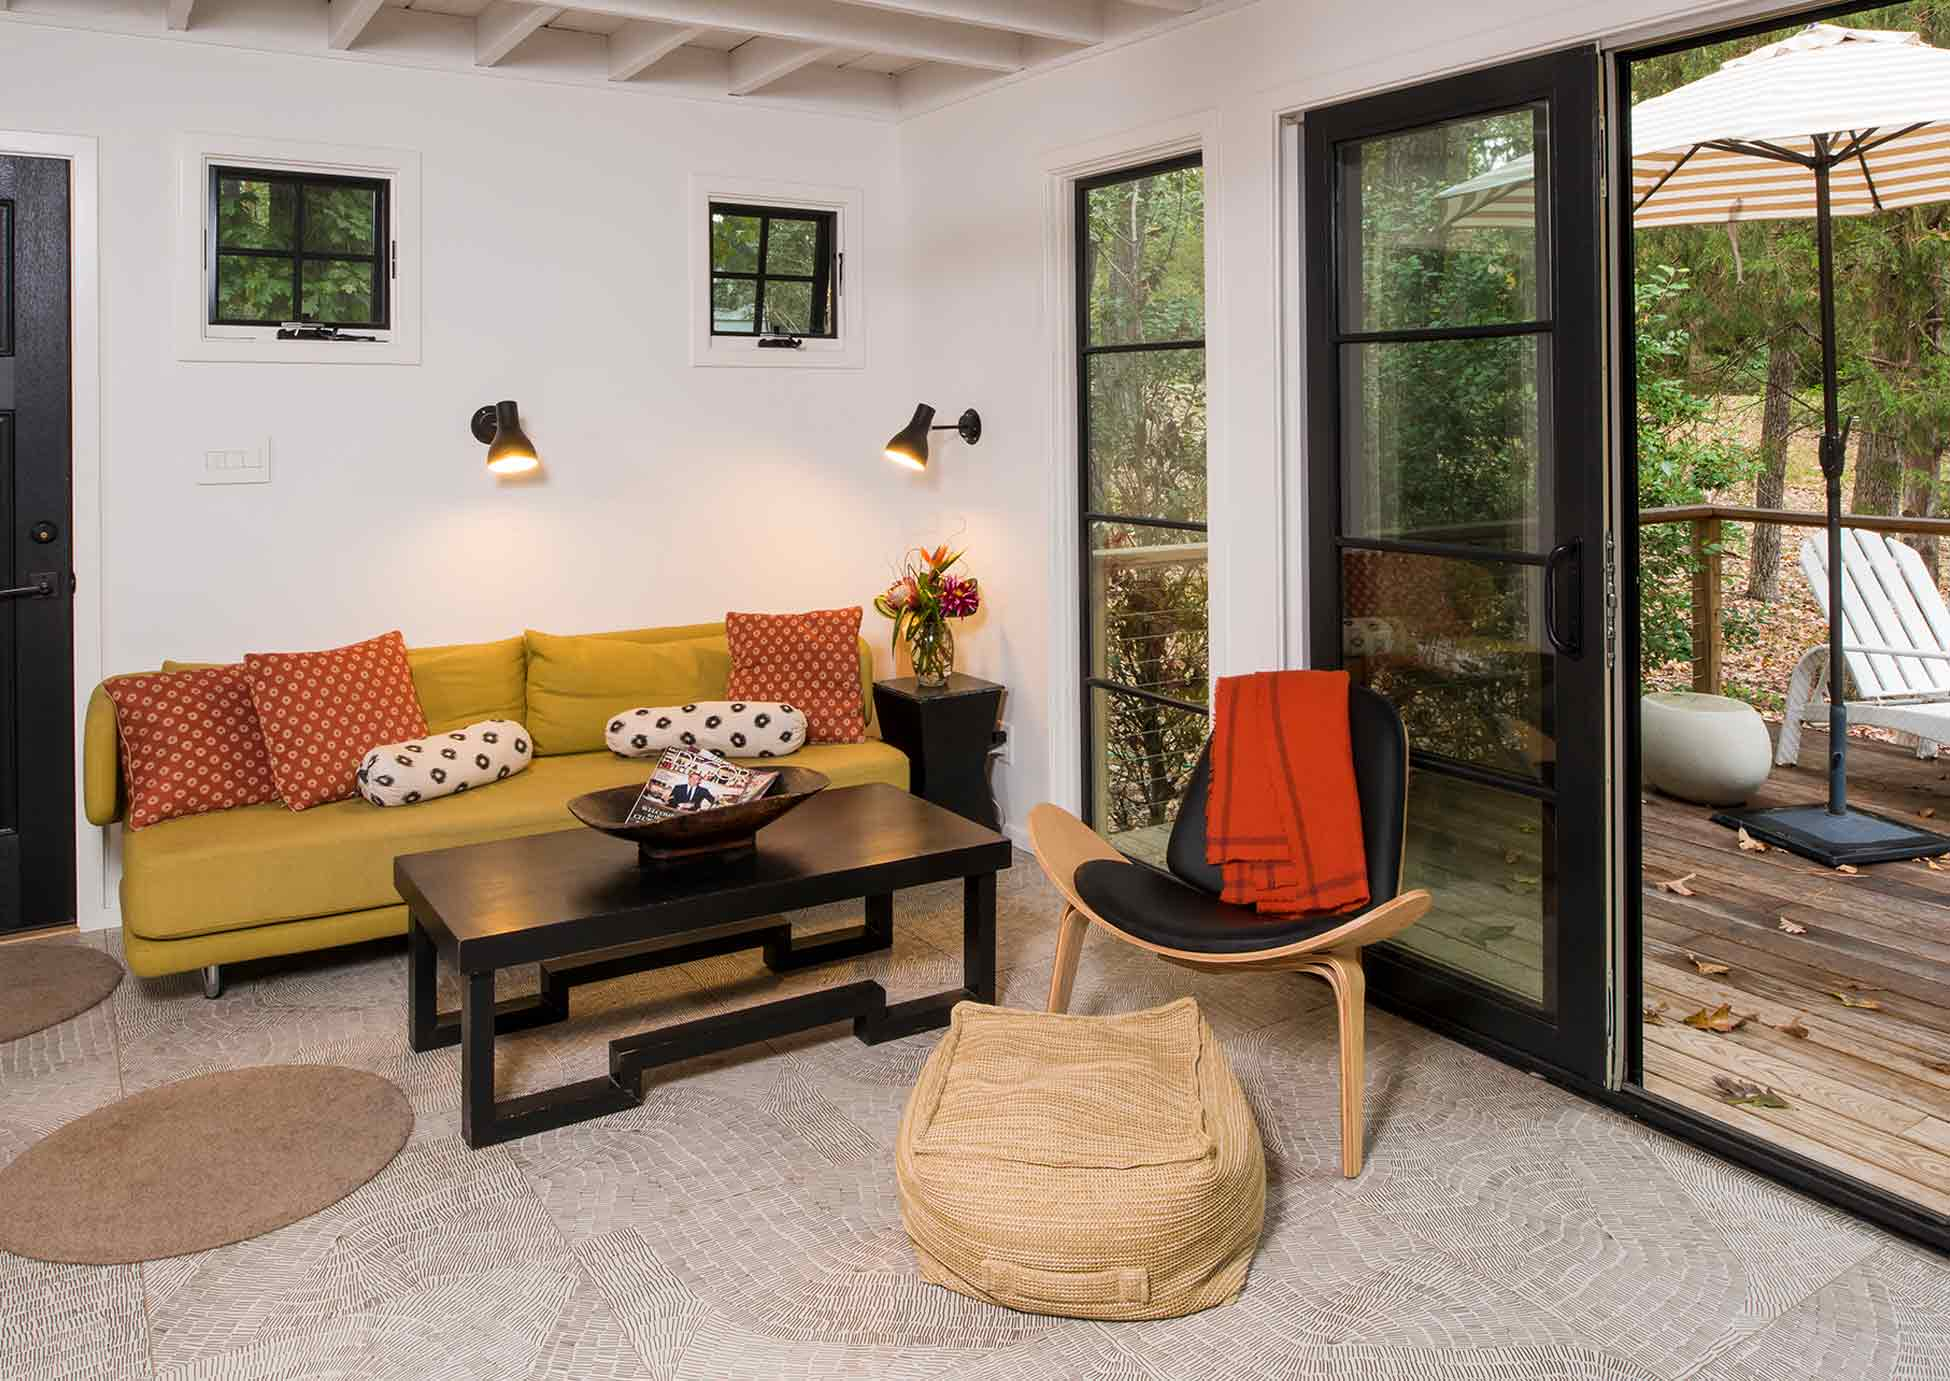 house renovations Chapel Hill NC, Cederberg Kitchens + Renovations